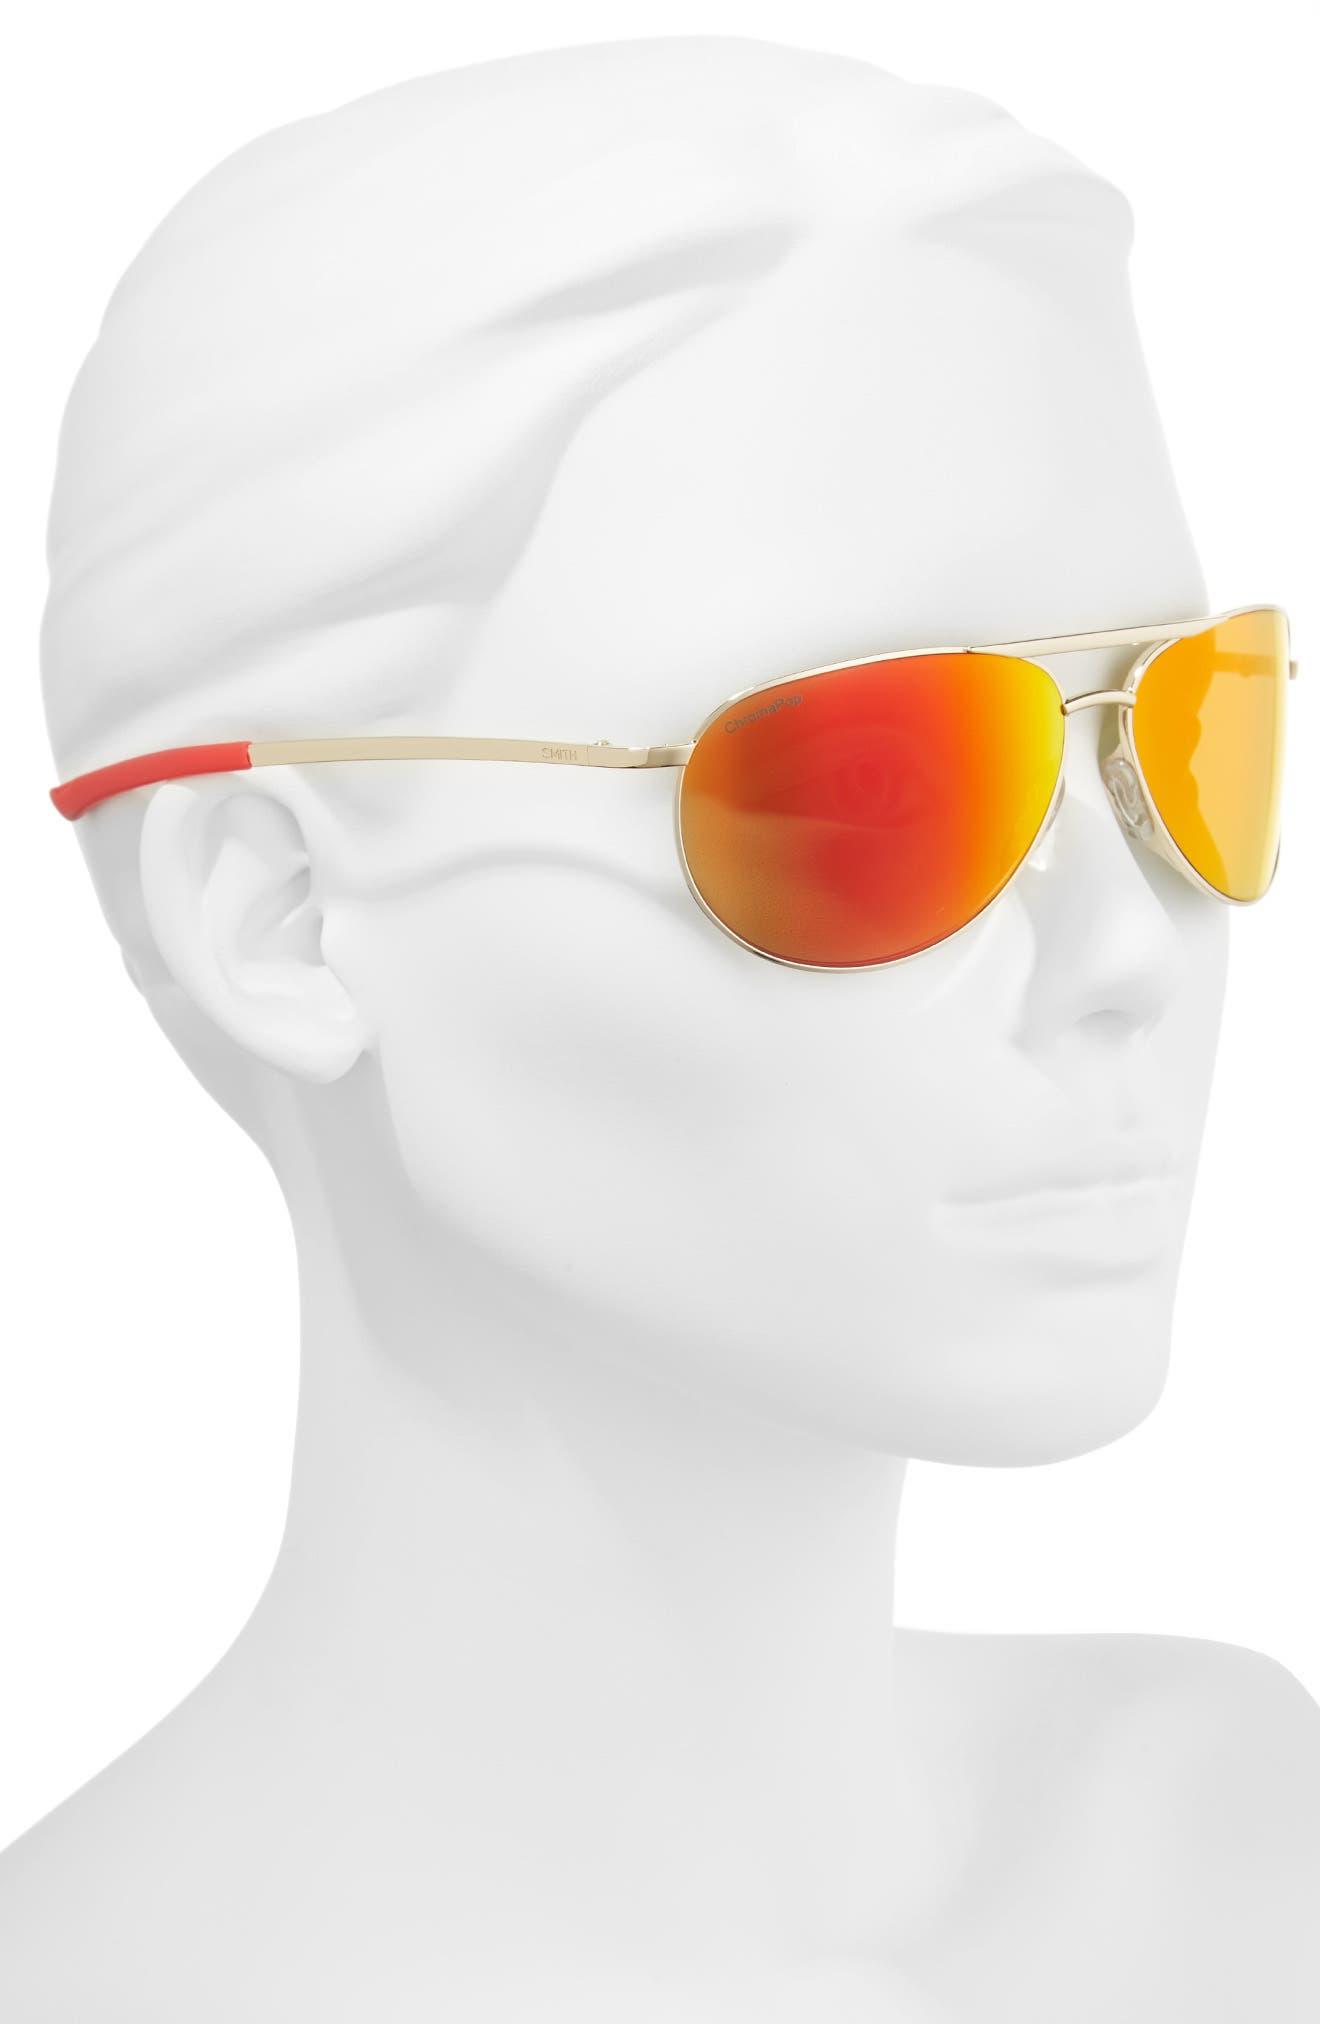 Alternate Image 2  - Smith Serpico Slim 2.0 60mm ChromaPop Polarized Aviator Sunglasses